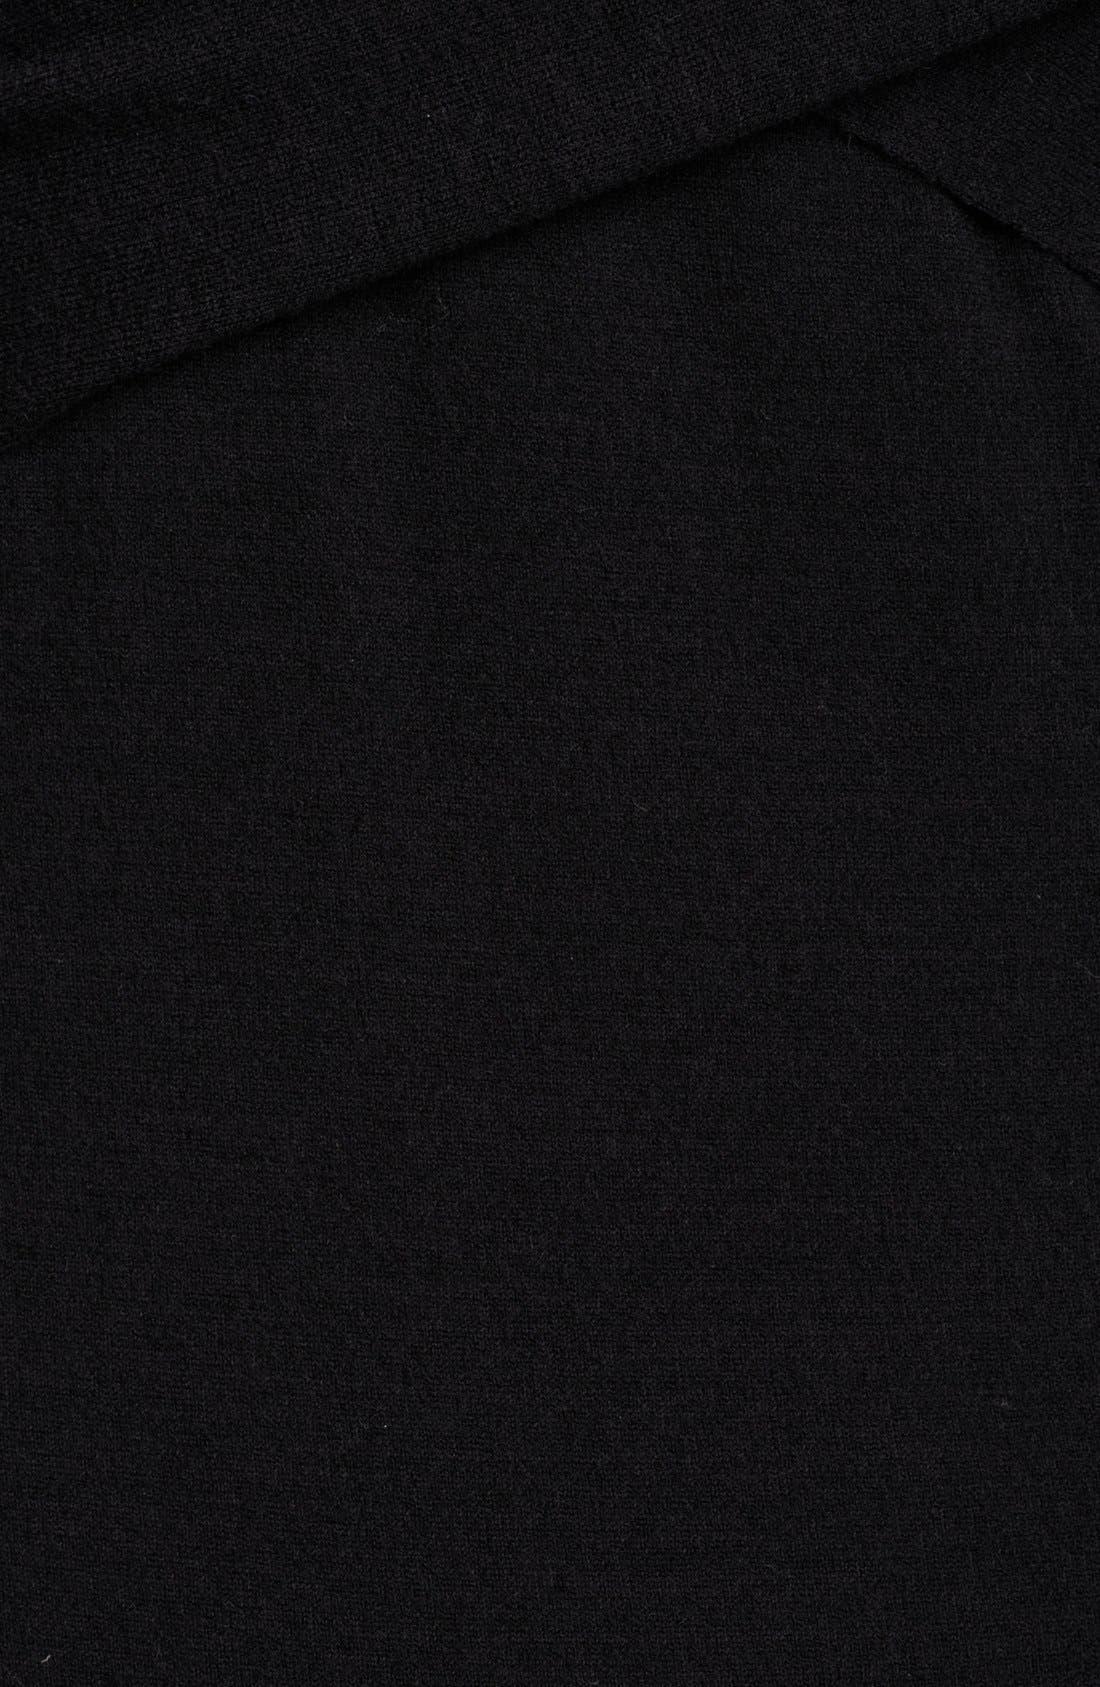 Alternate Image 3  - Donna Karan Collection 'First Layer' Cashmere Blend Dress